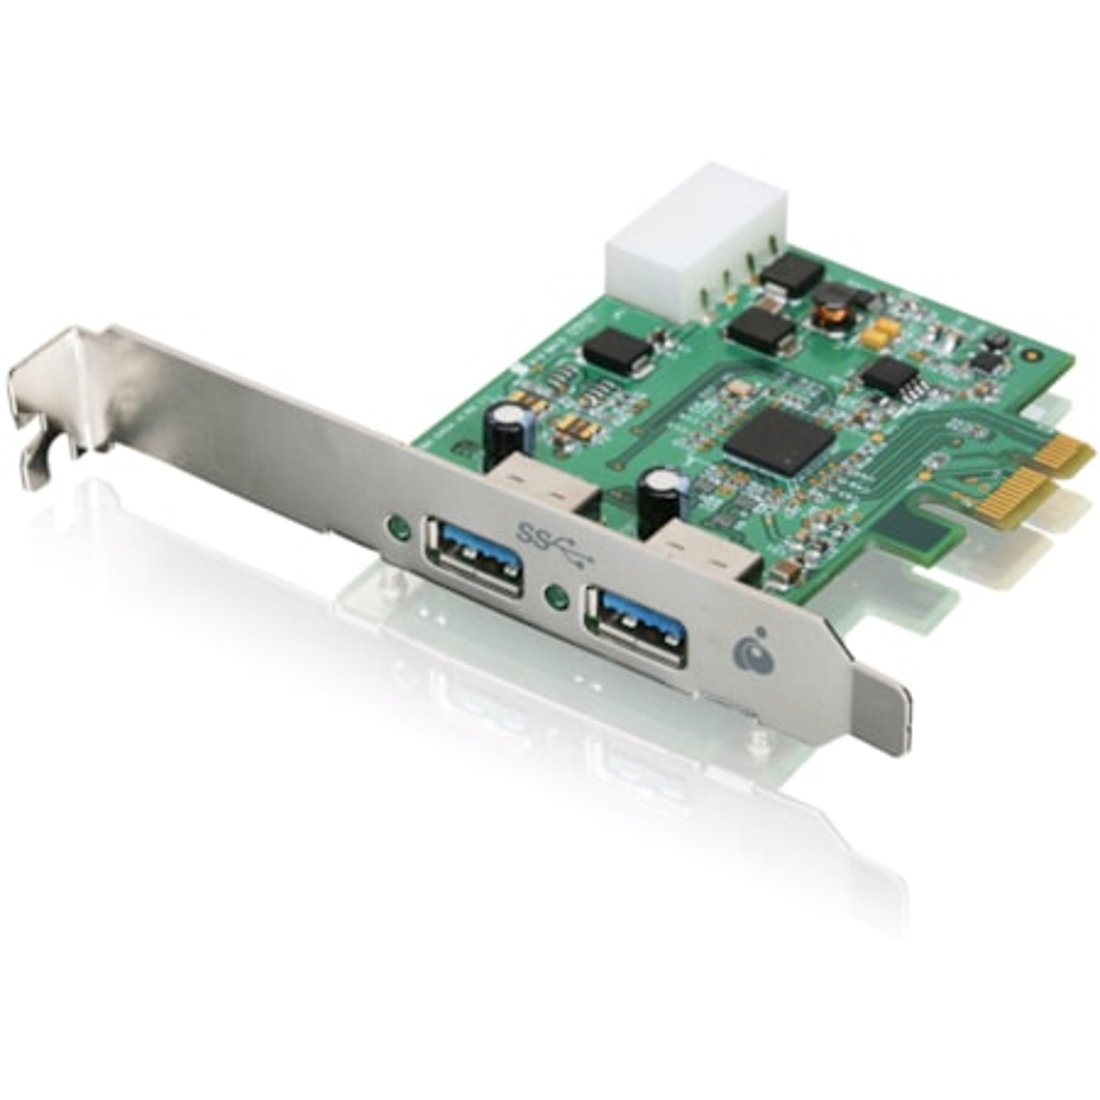 IOGEAR GIC320U USB Adapter - PCI Express 2.0 - Plug-in Card